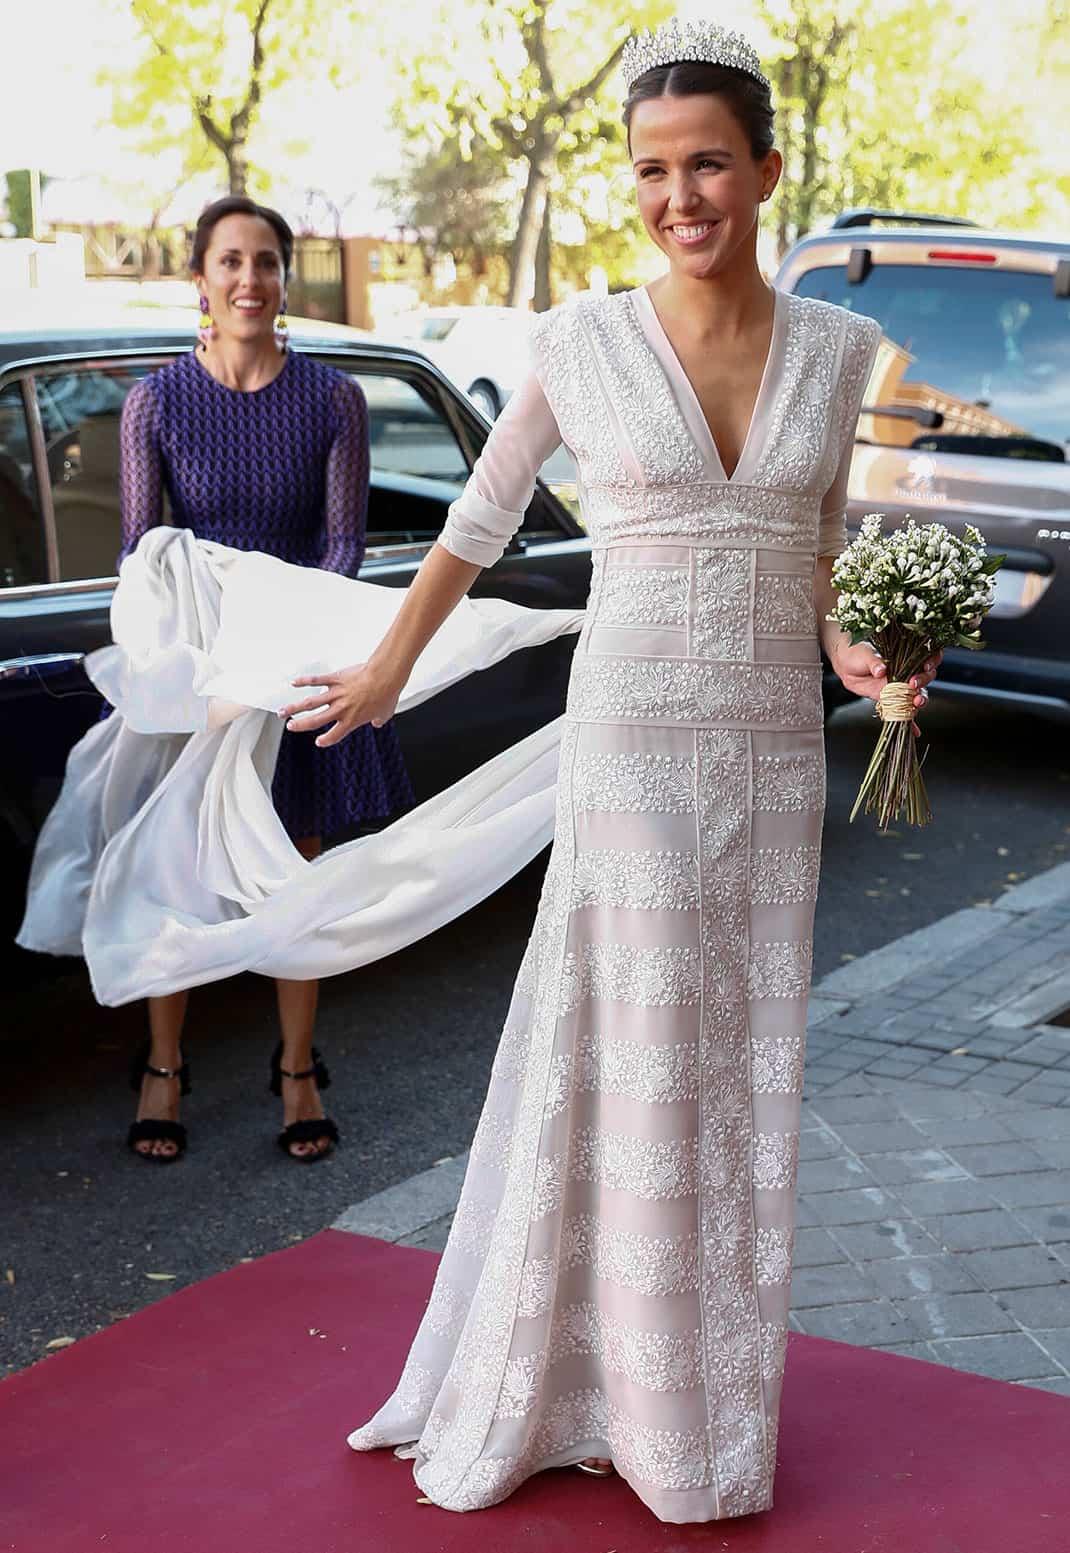 Disenador vestido novia laura ponte